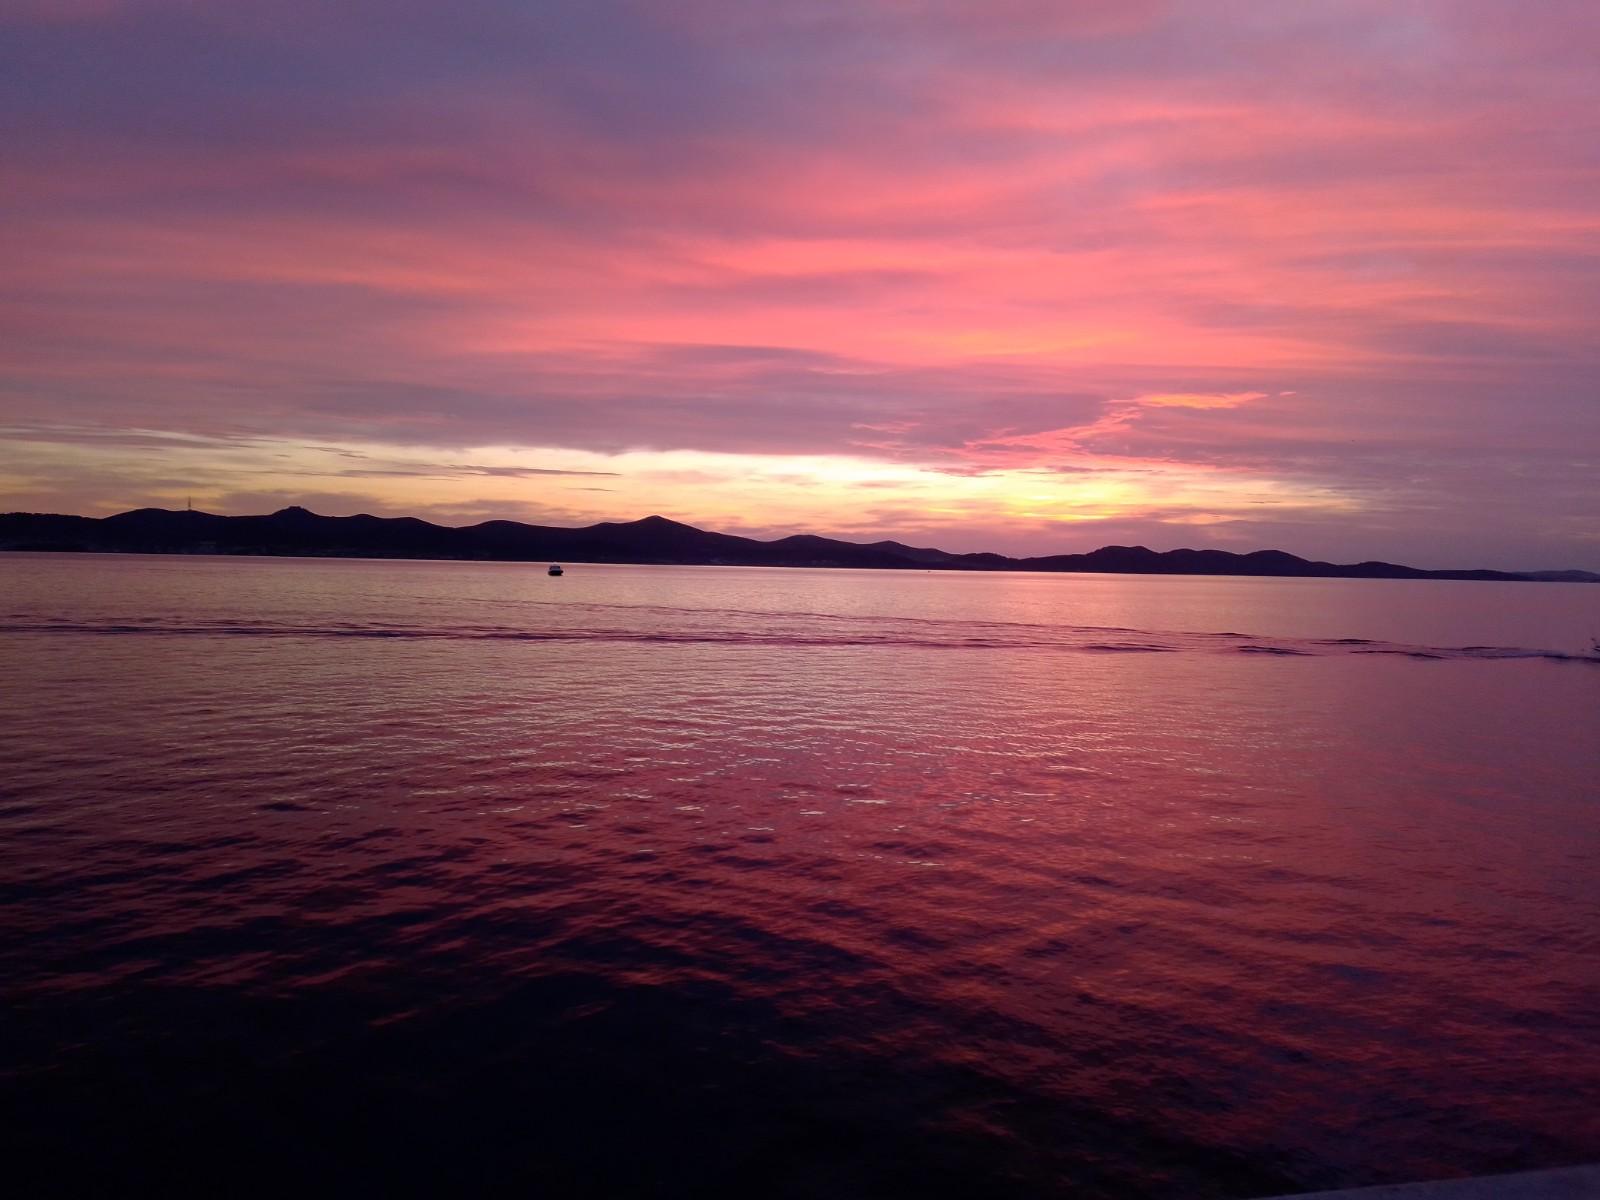 Sunset in Croatia. Kajan Experience, www.dubrovnikguidetours.com